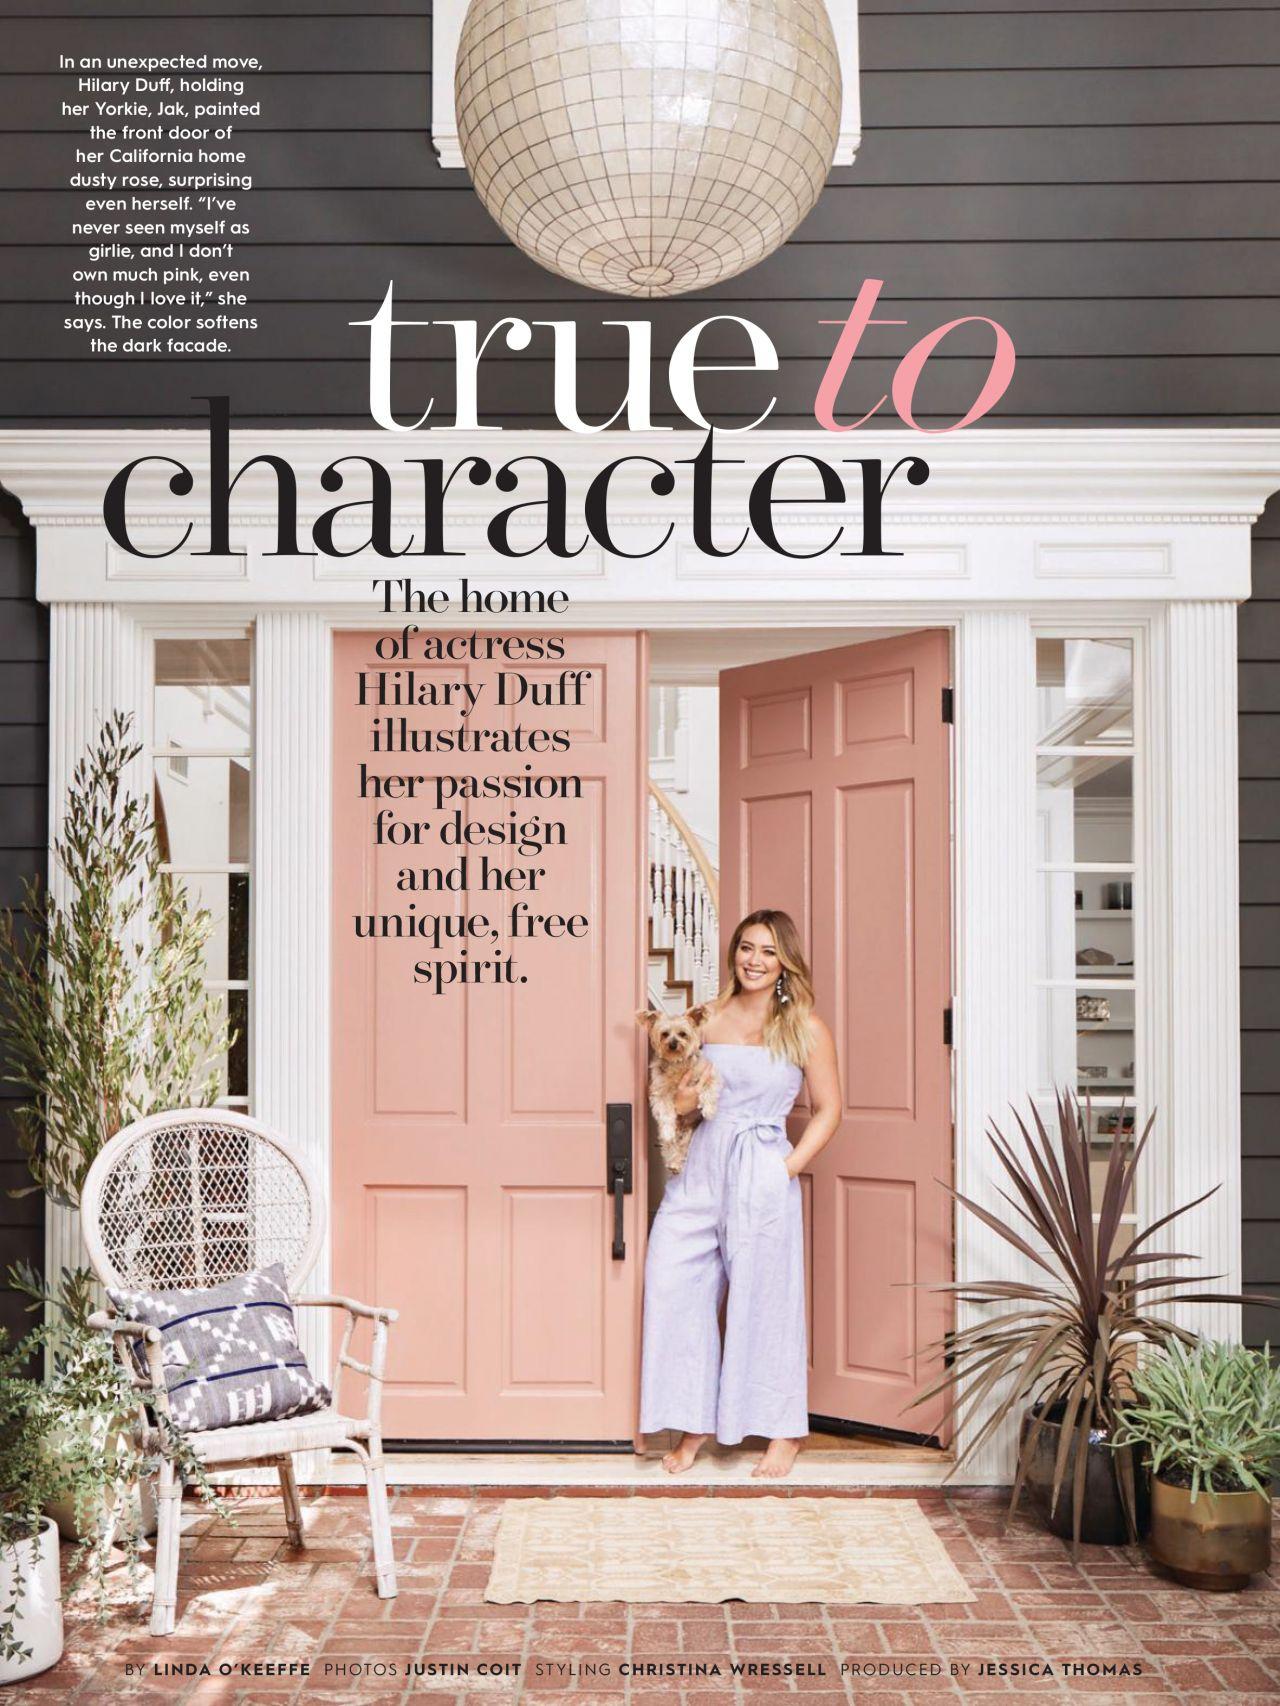 Hilary Duff Better Home And Garden Magazine February 2018